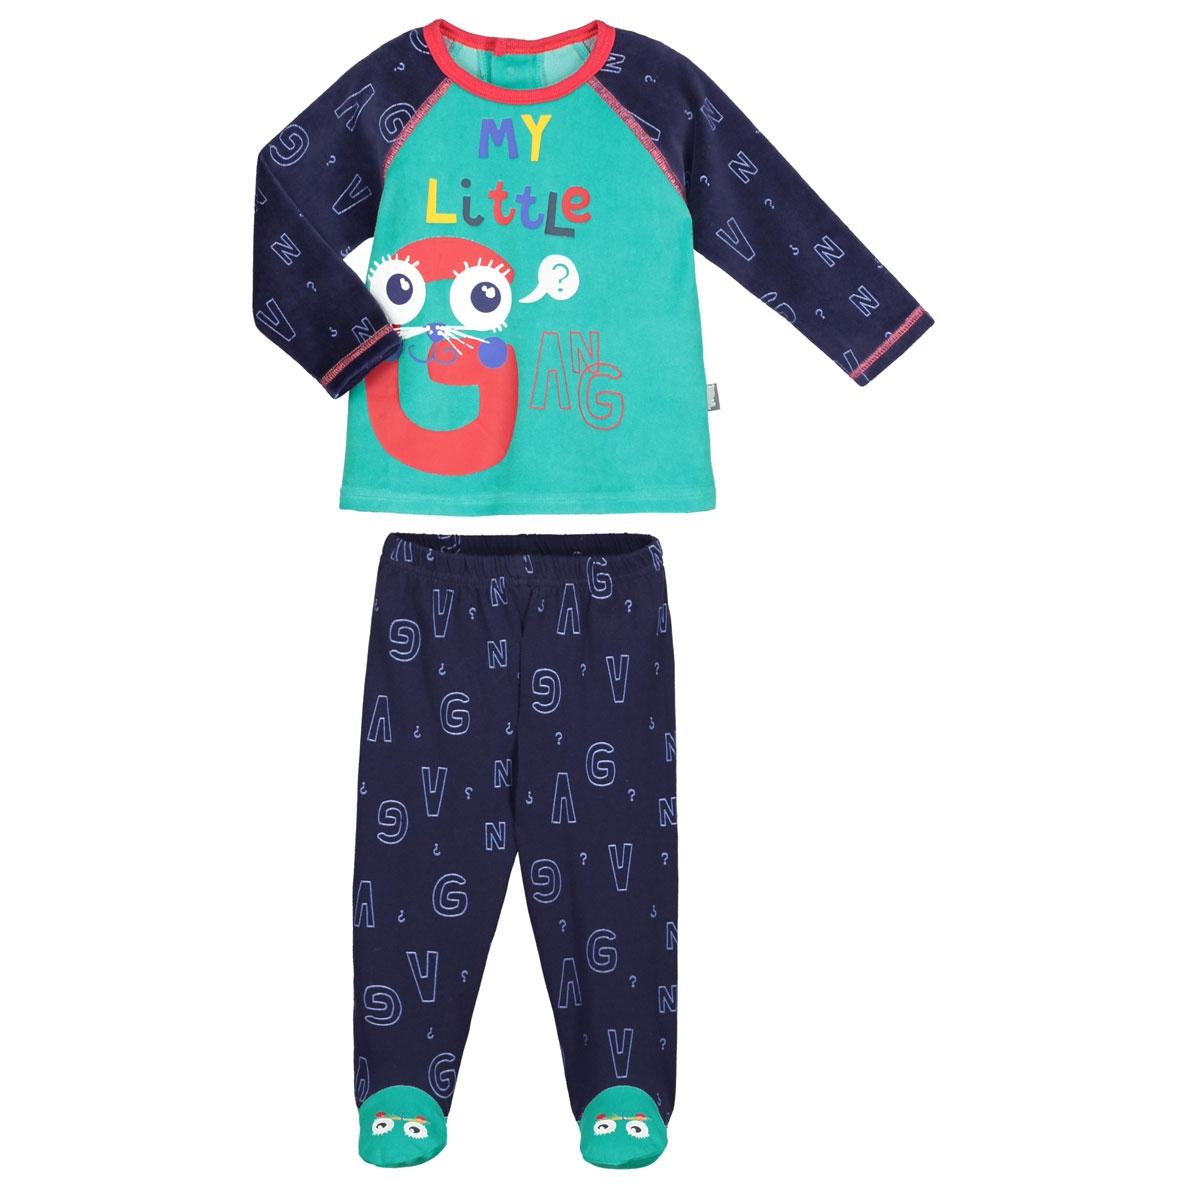 540d067e7ca85 Pyjama bébé 2 pièces avec pieds Gang - PETIT BEGUIN